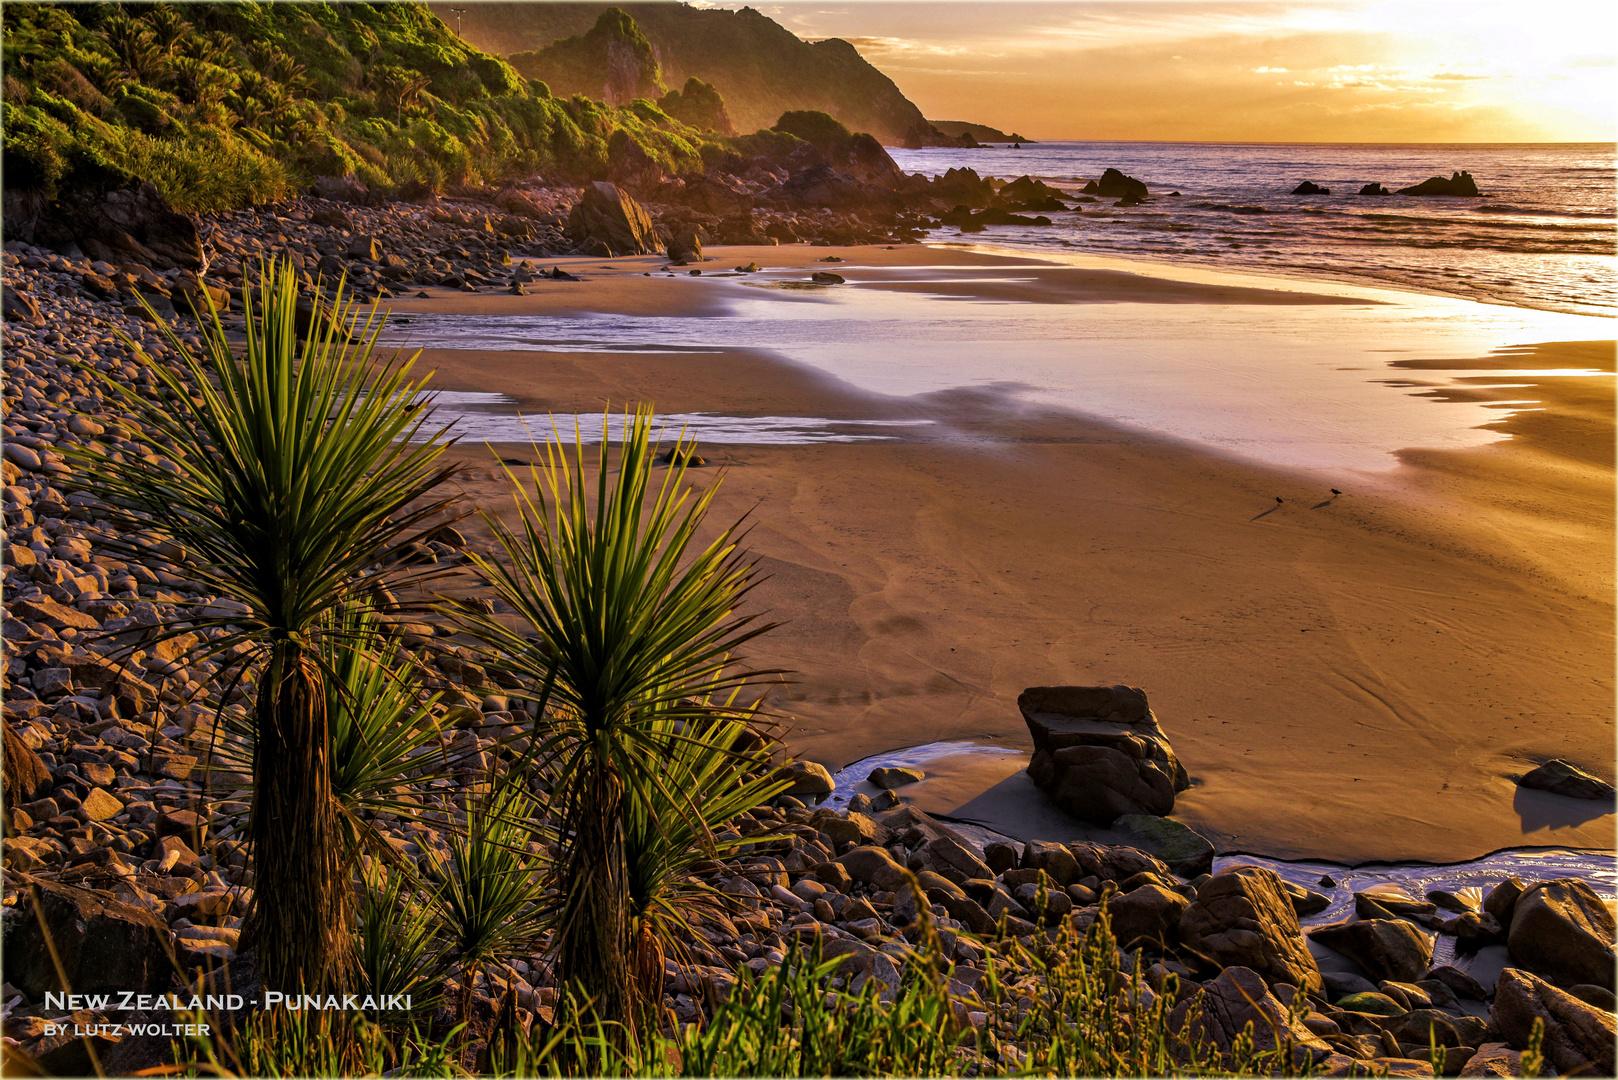 Neuseeland - Punakaiki